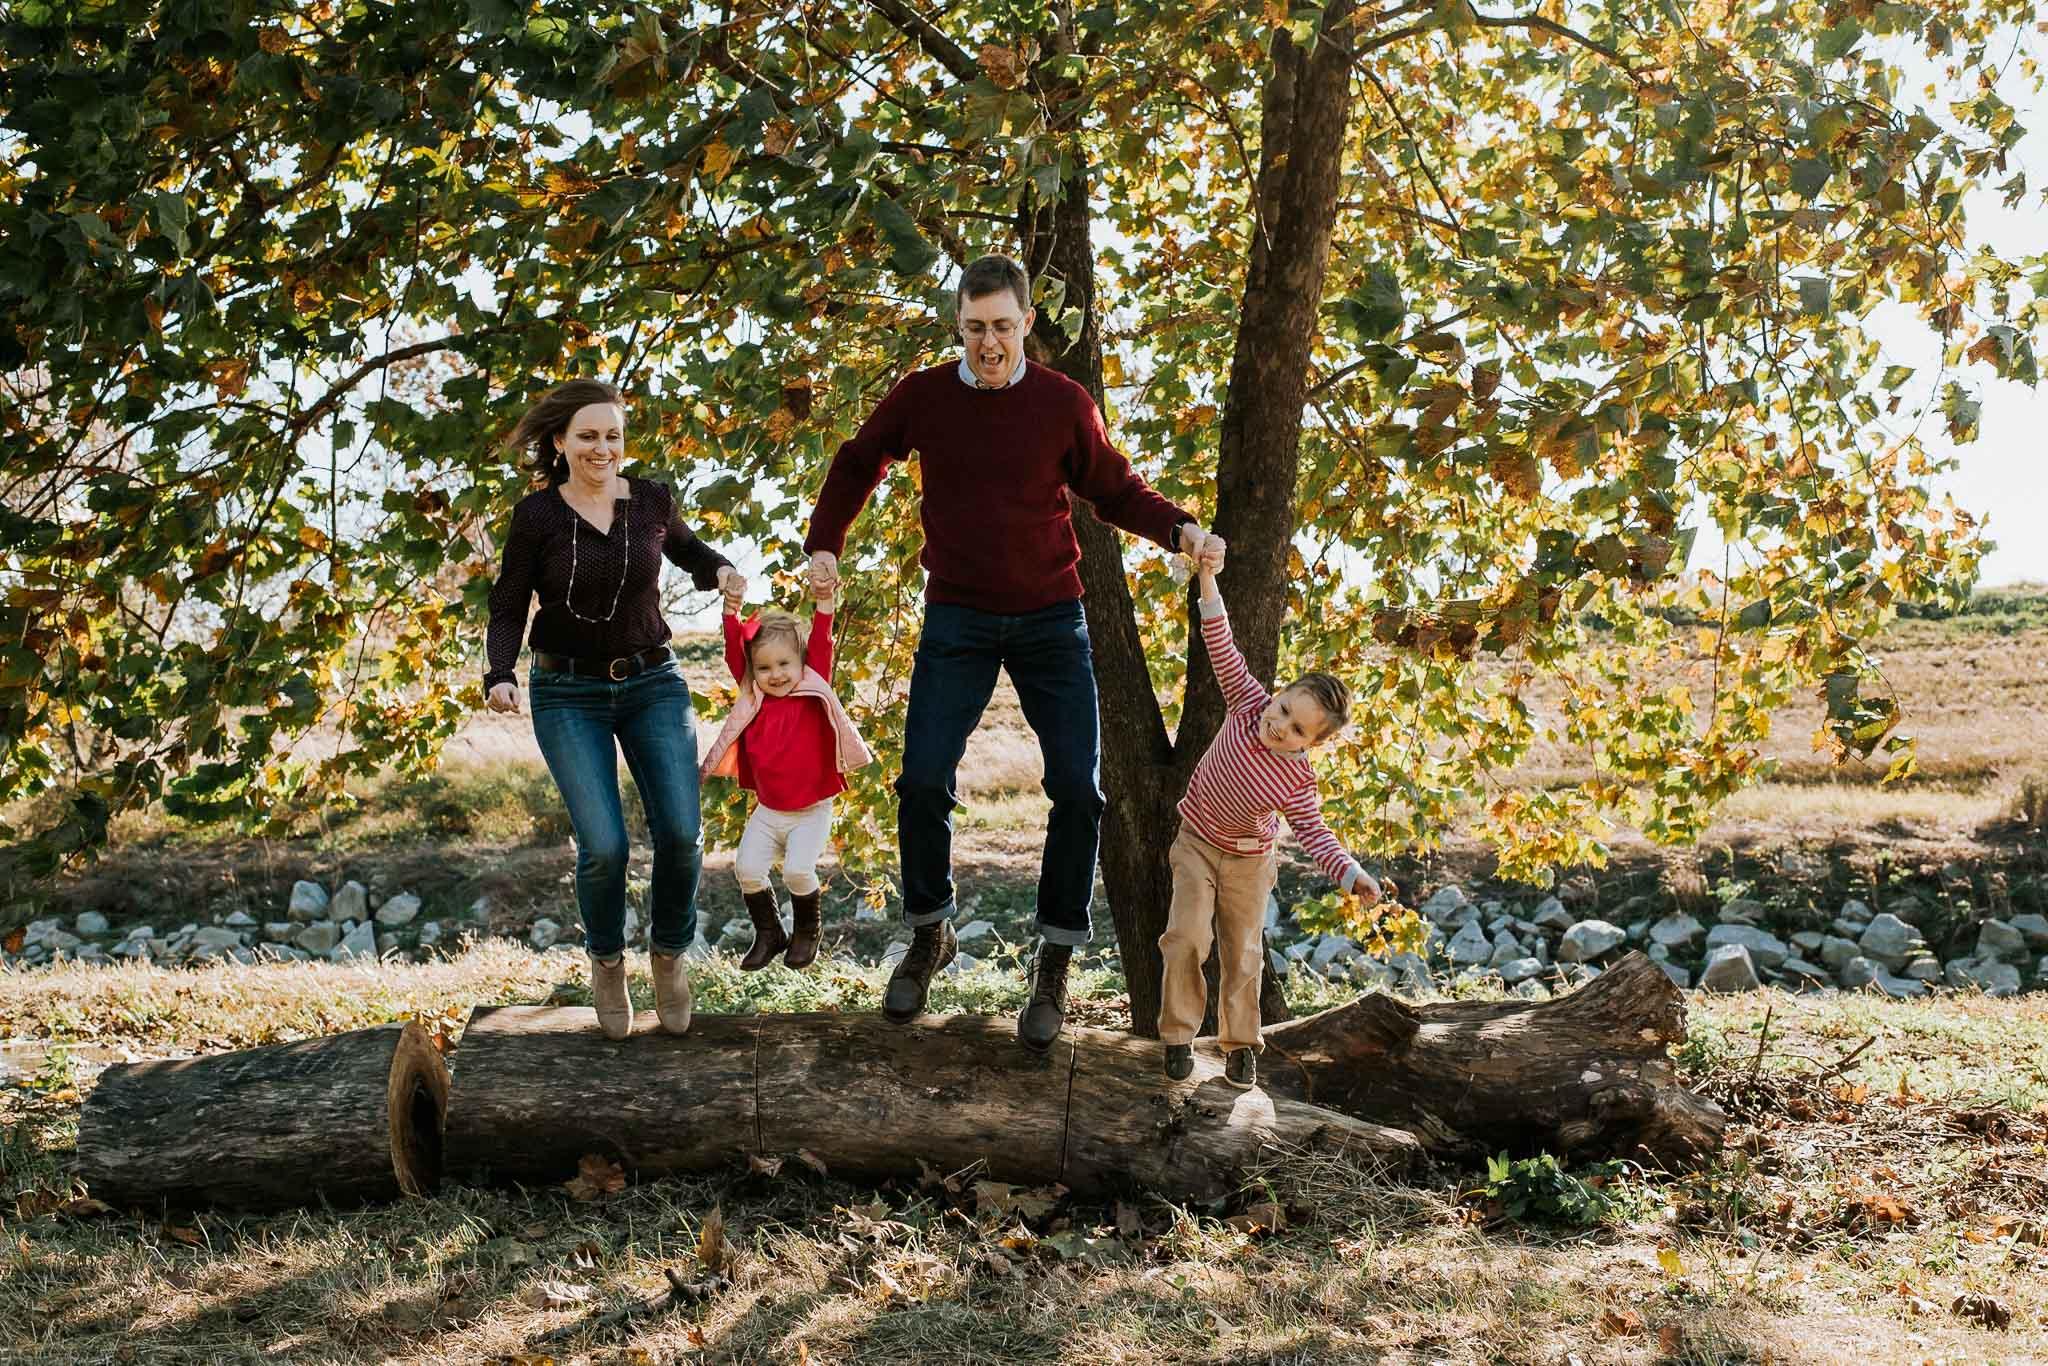 family photography outdoors washington dc